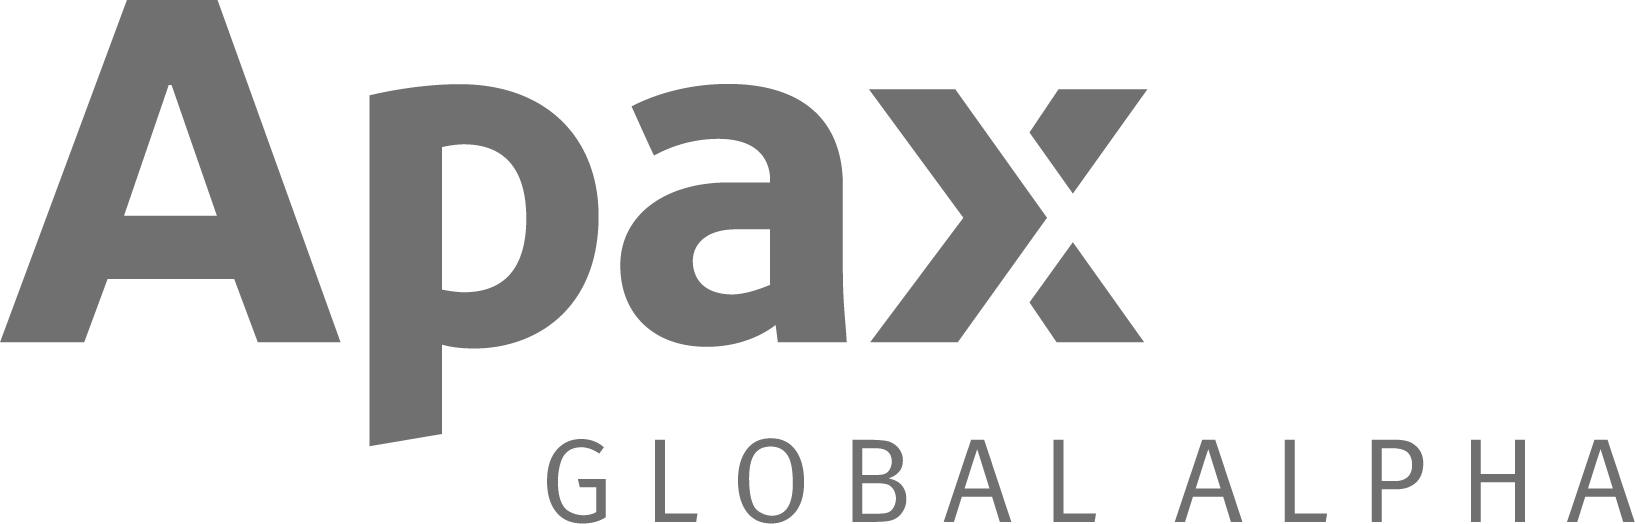 Apax Global Alpha Ltd Logo